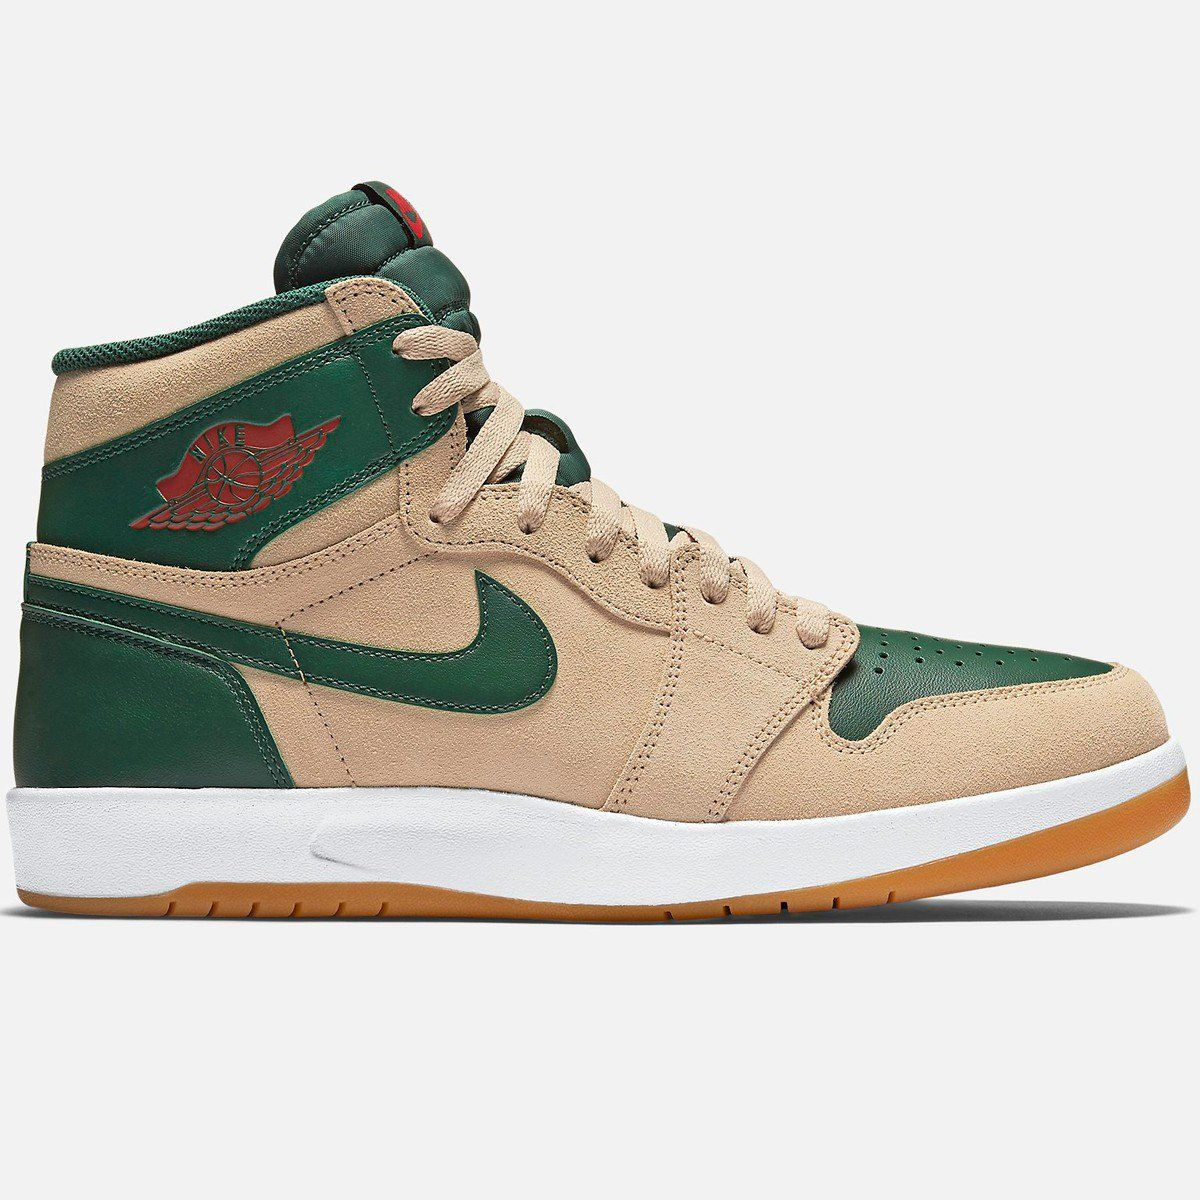 Air Jordan 1 High The Return Sand Dune/Gorge Green/White/University Red